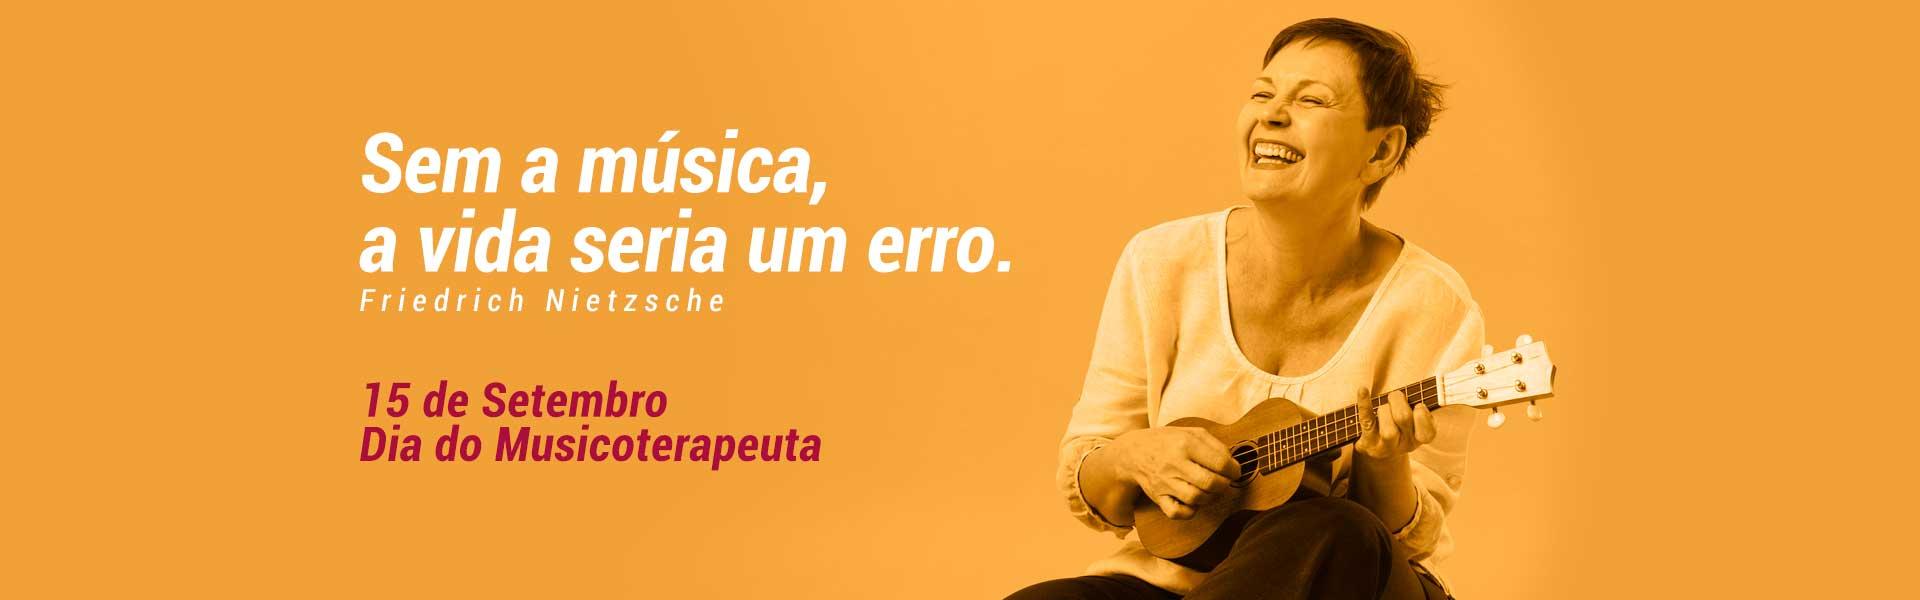 banner-exemplo-amtpr-dia-do-musicoterapeuta